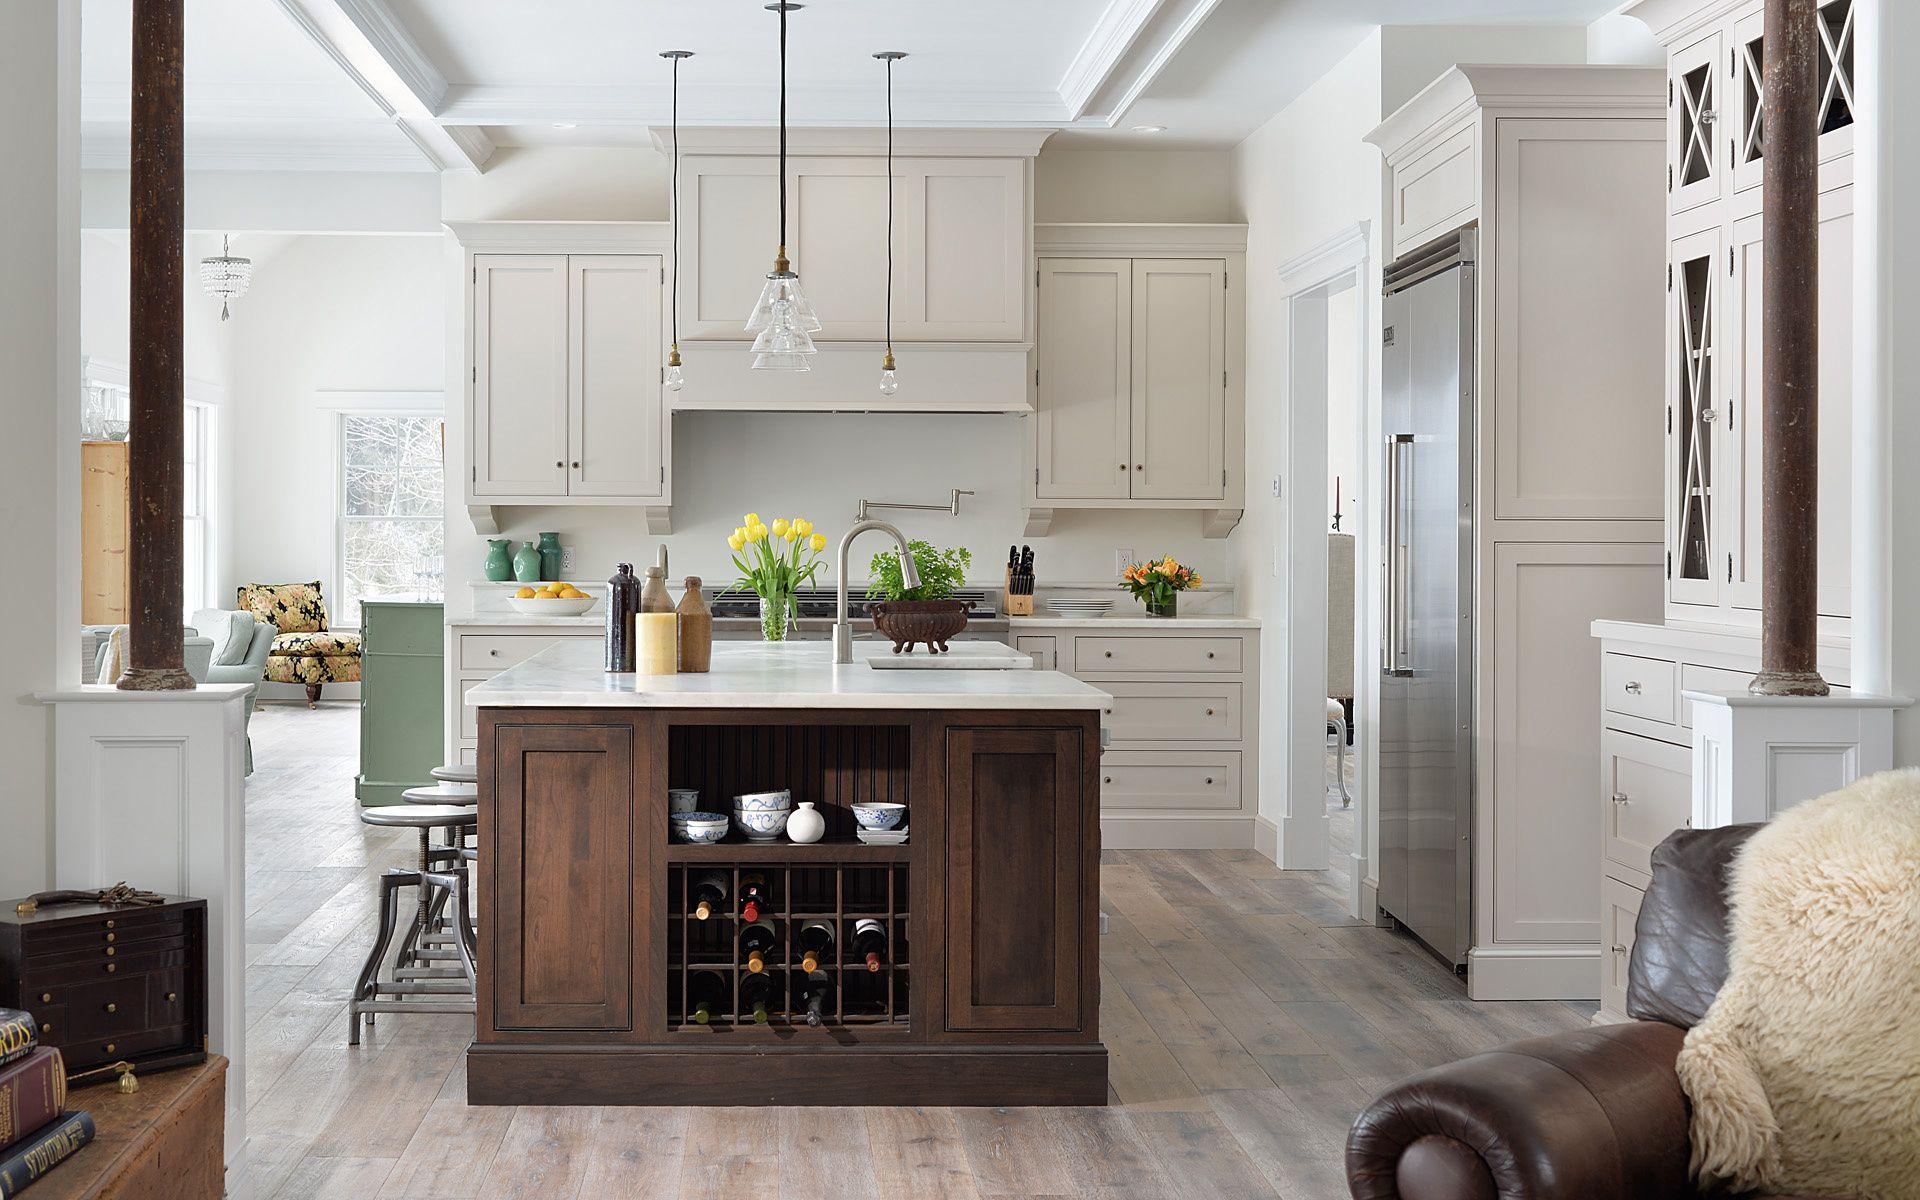 © 2016 Kim Smith Photo. Interiors | Kitchen | Cabinetry ...